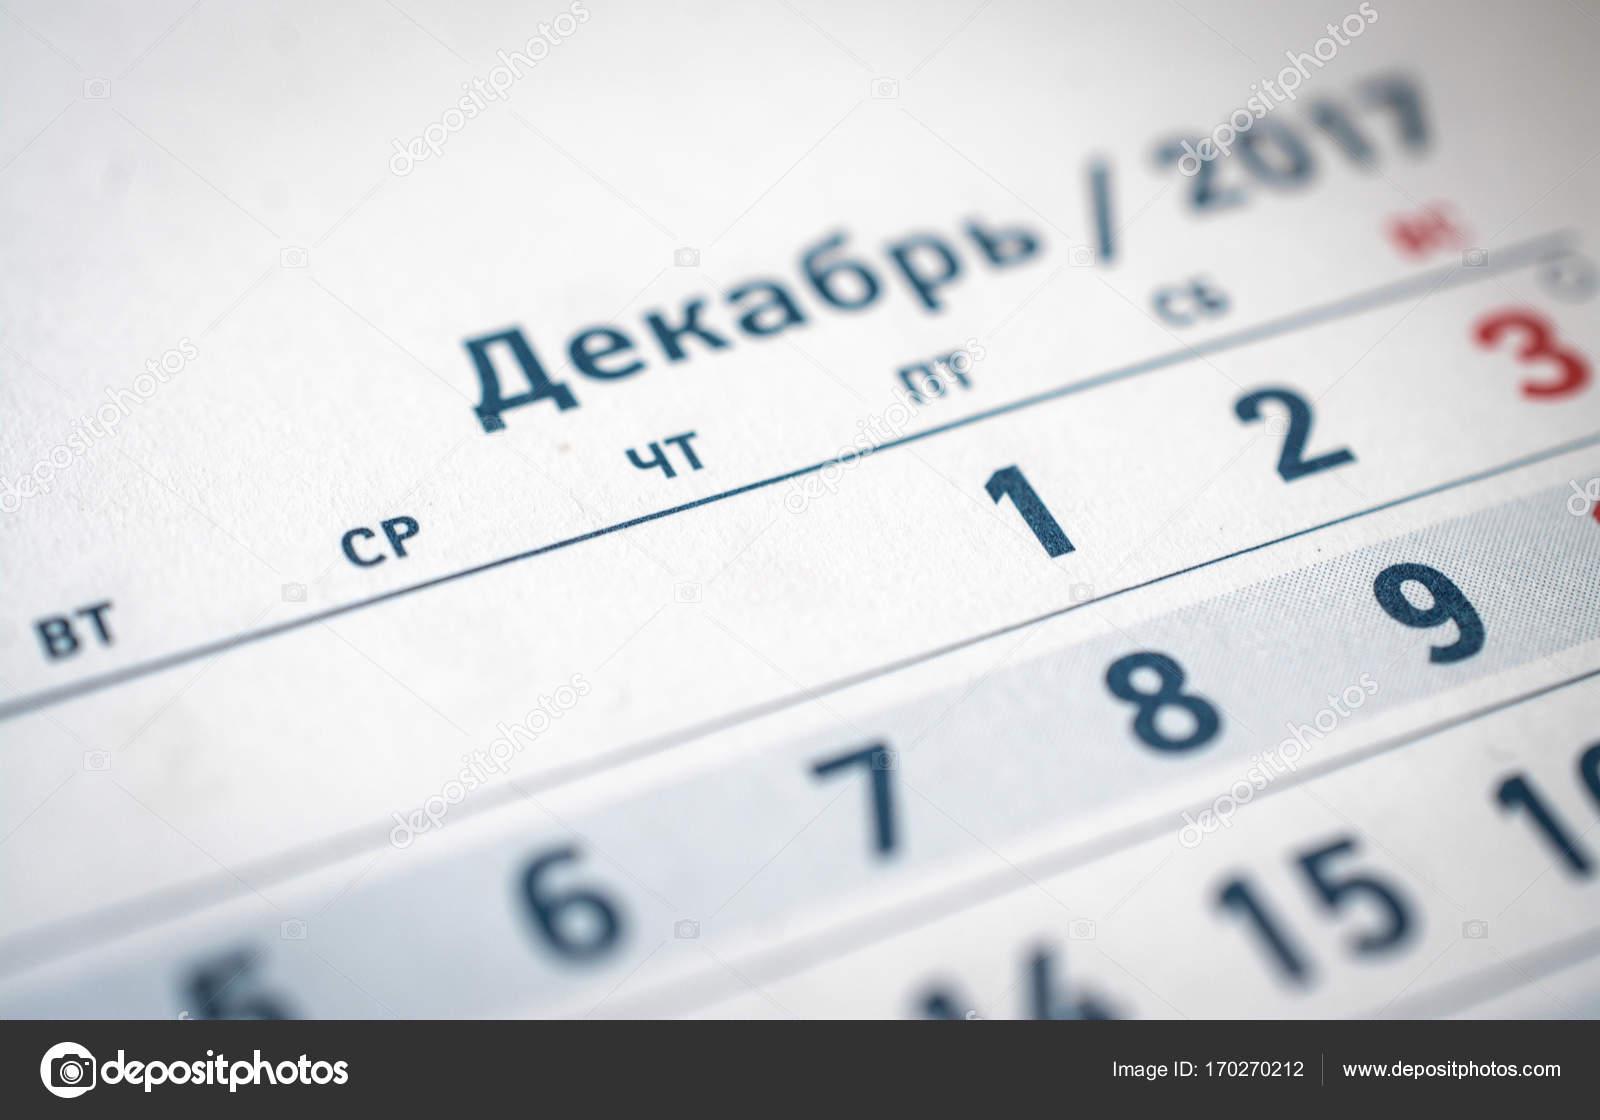 Calendrier Traduction.Calendrier De Pres Traduction Mois De Decembre